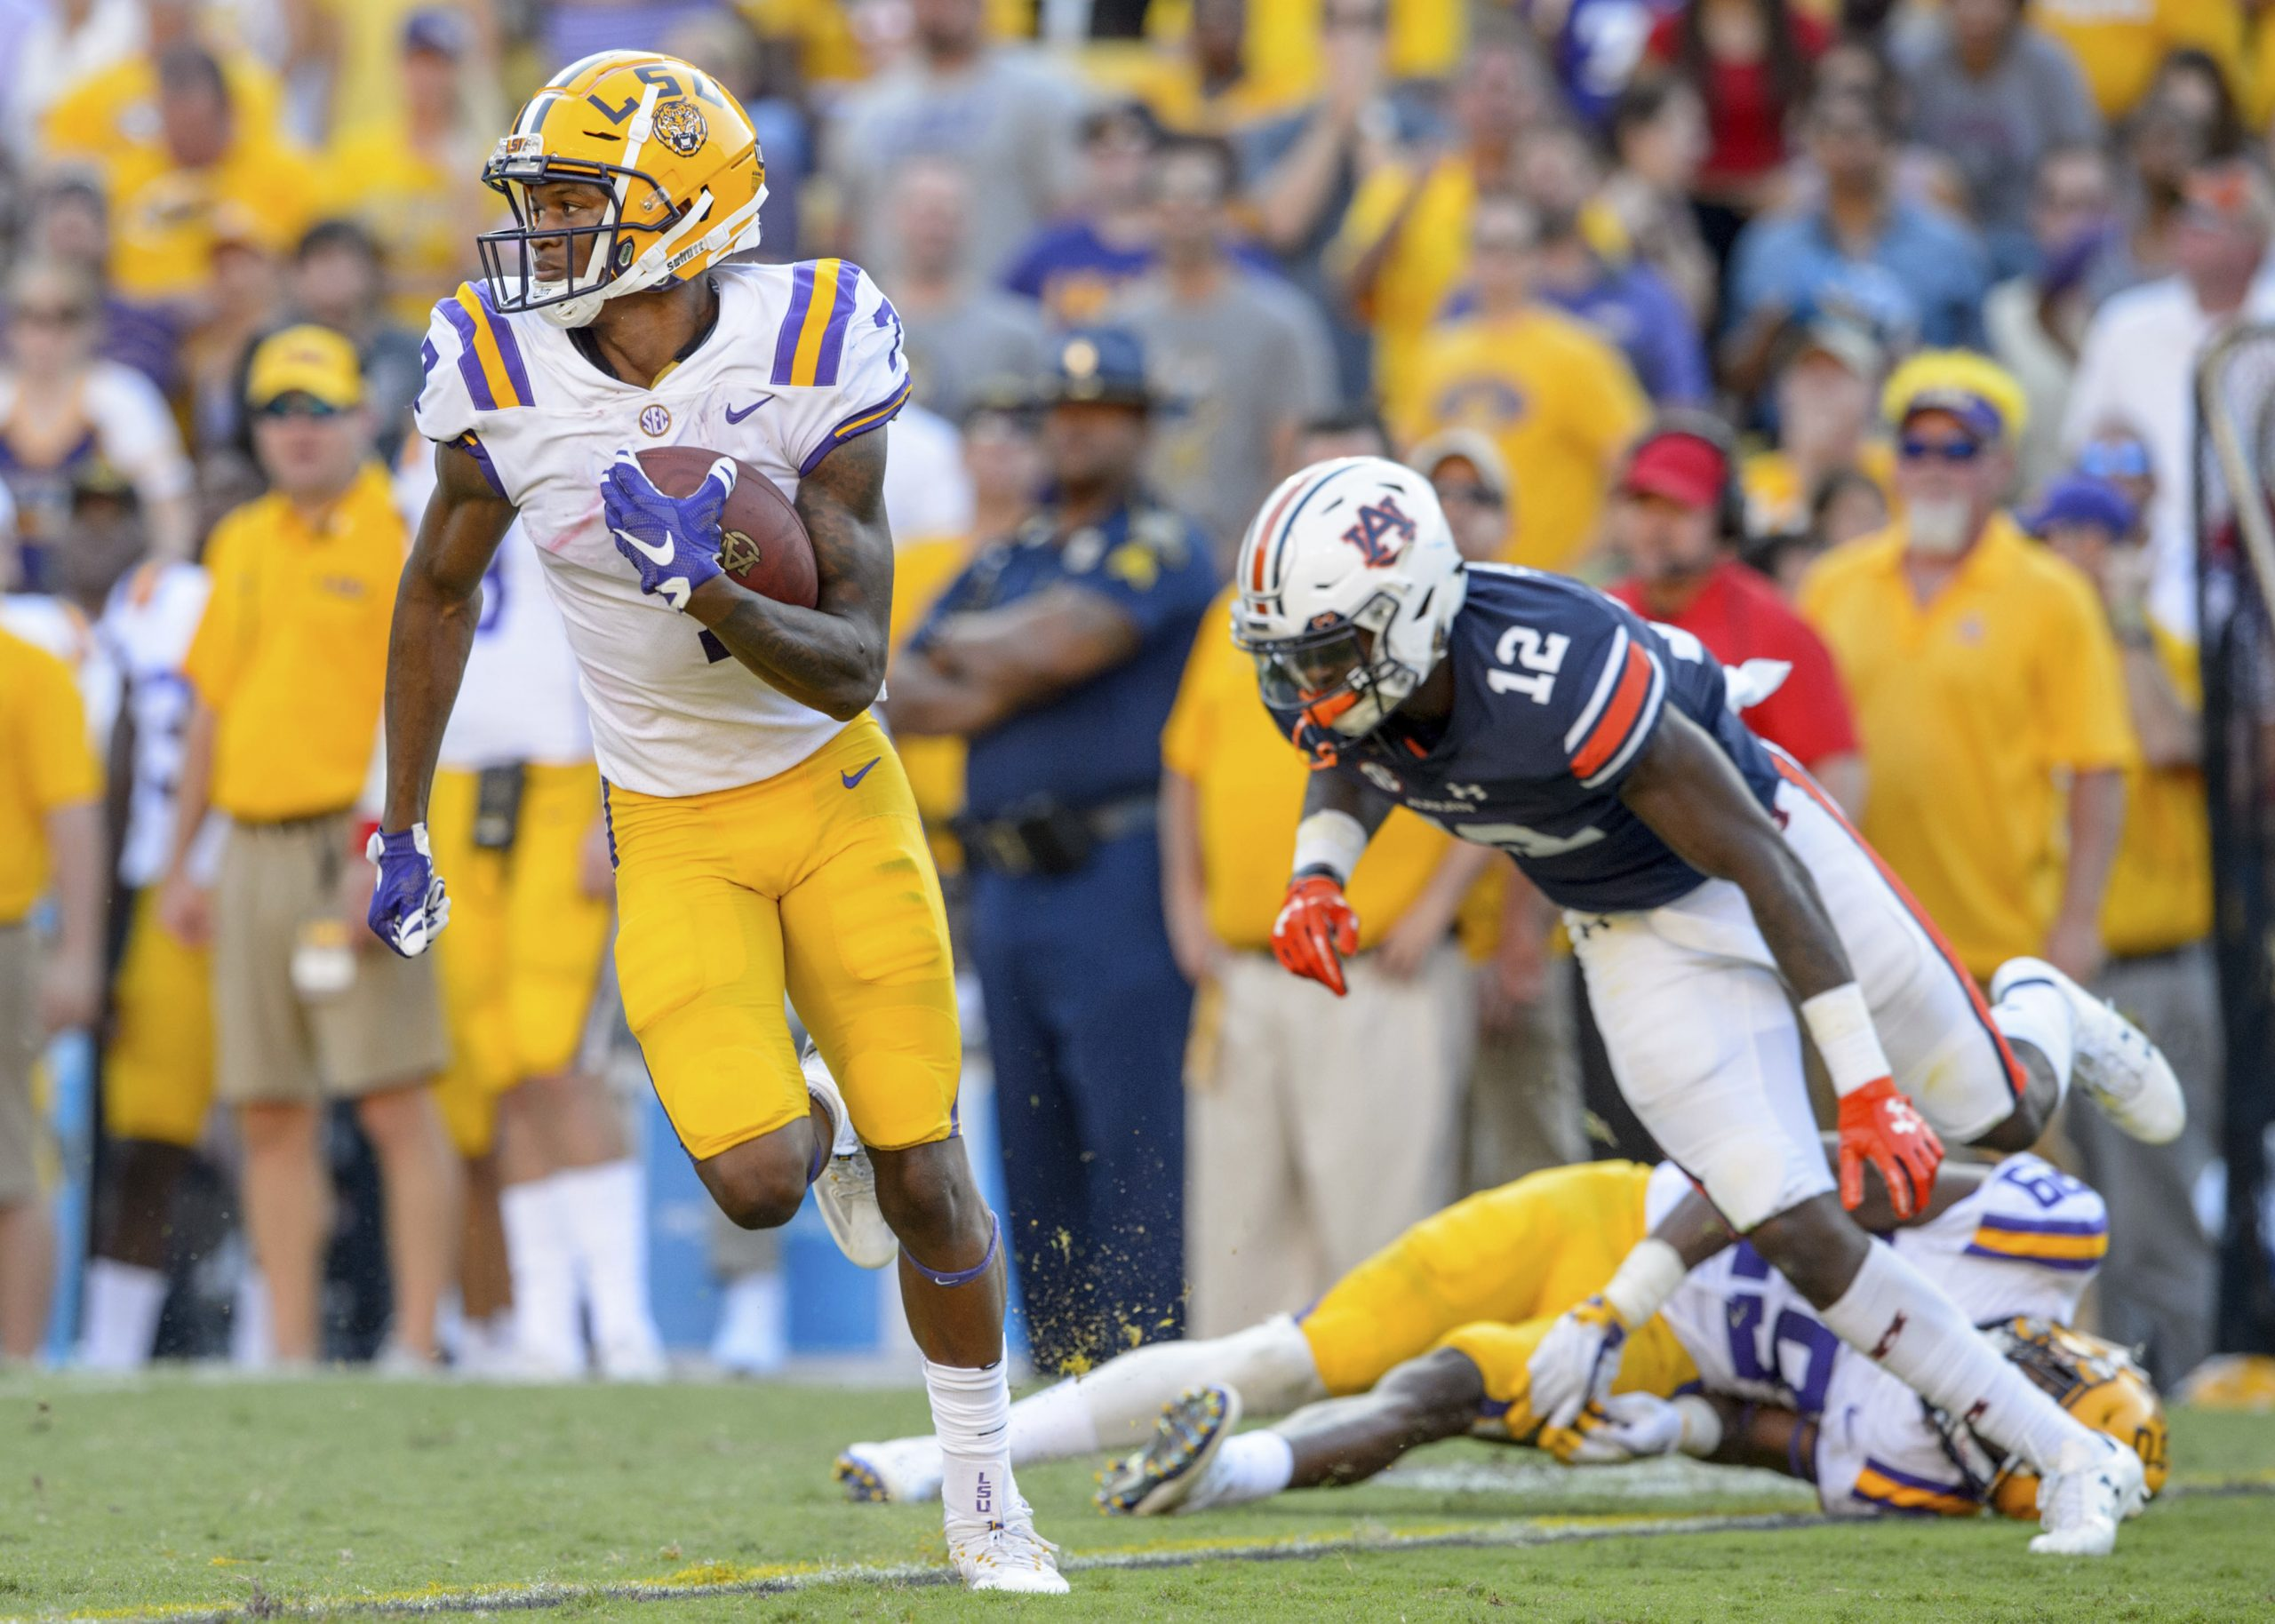 LSU mounts historic comeback to defeat Auburn